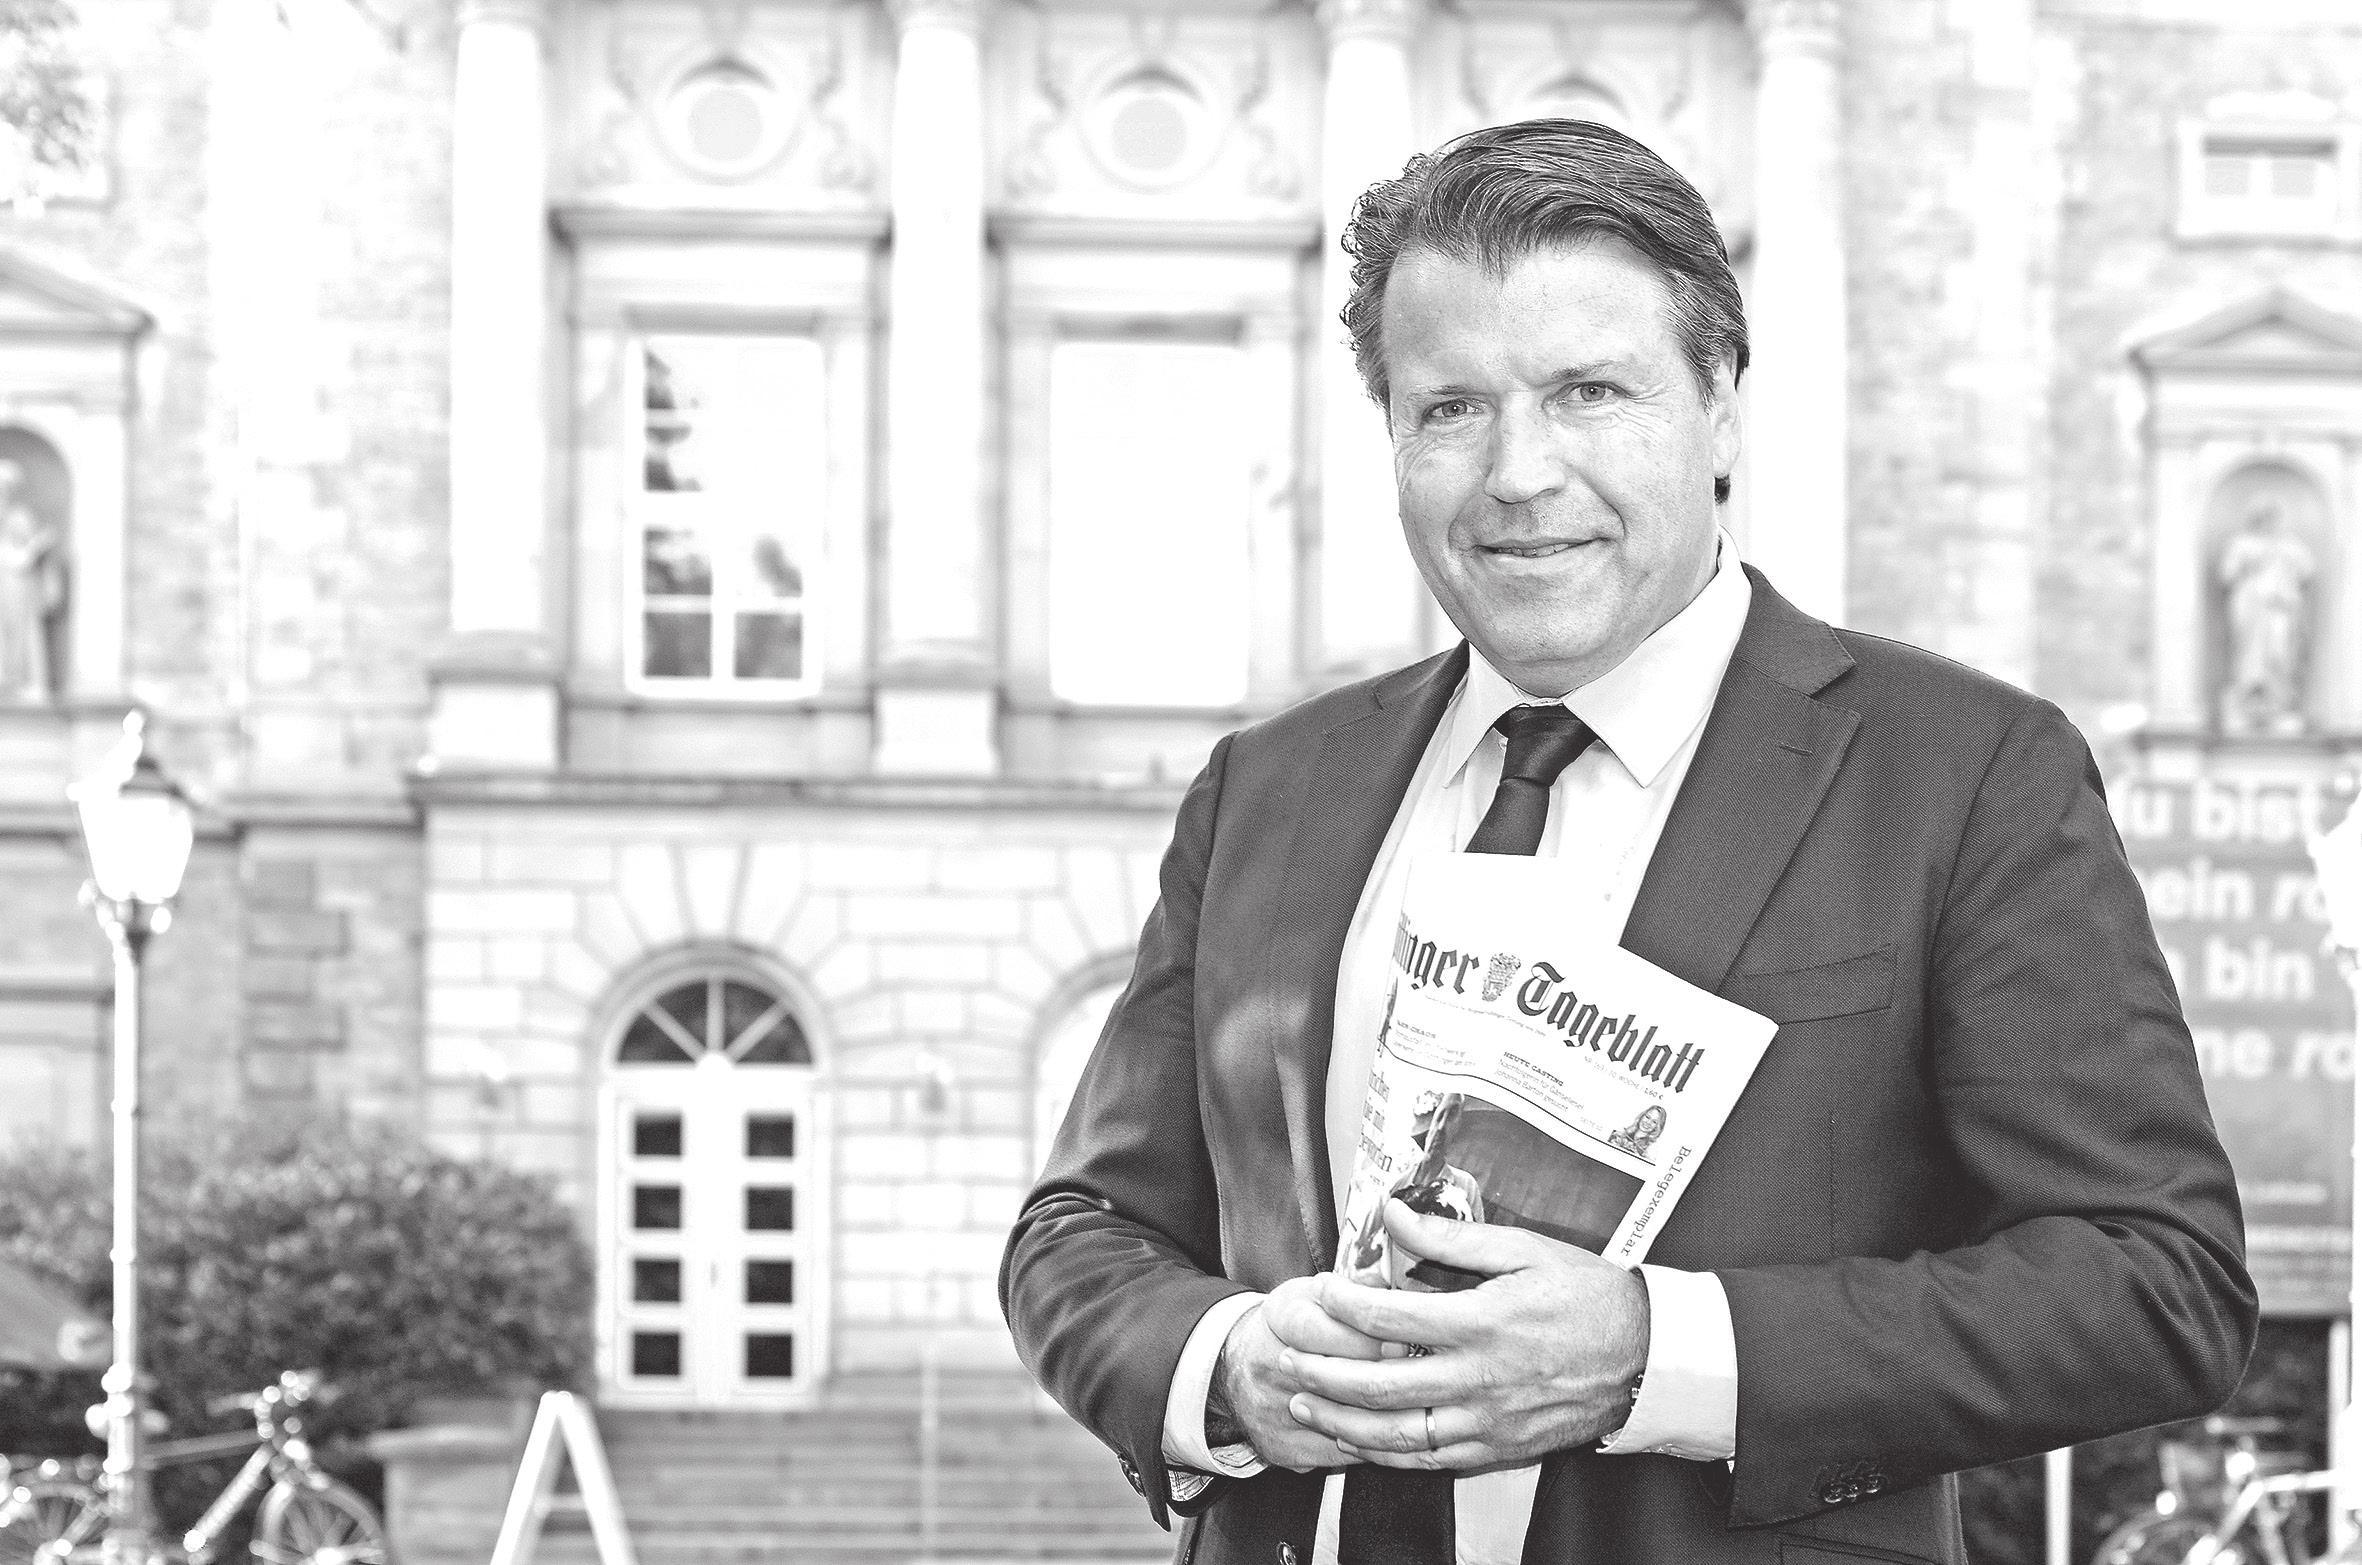 Dr. Uwe Graells